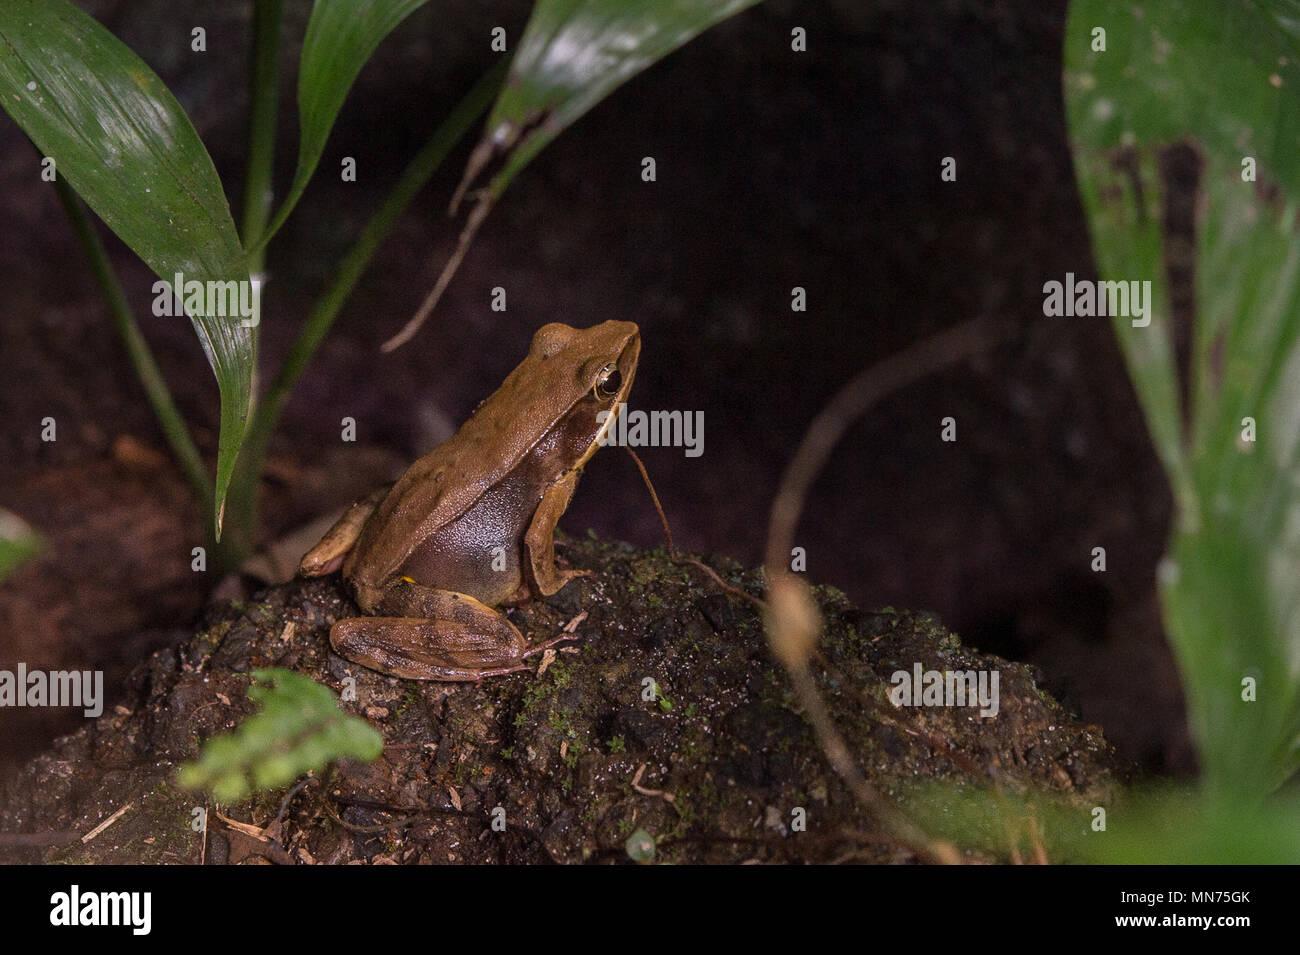 Brillante Wald Frog, Rana warszewitschii (Lithobates), Ranidae, Costa Rica, Centroamerica Stockbild